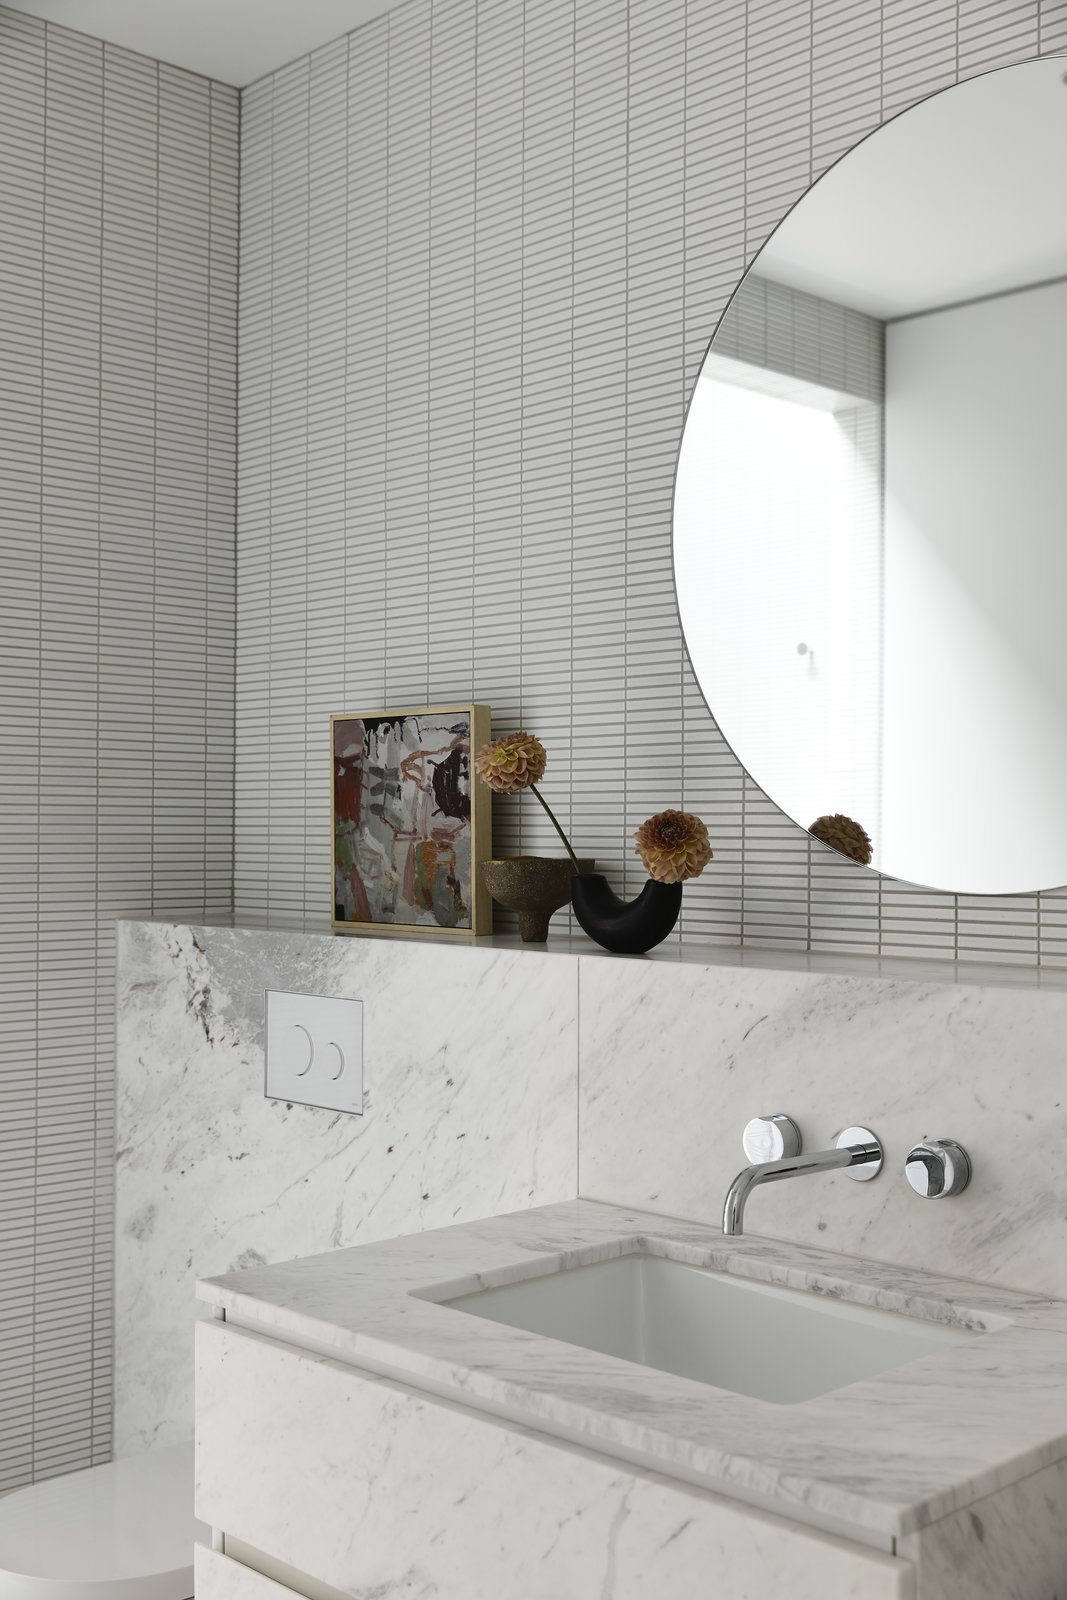 Scandizzo House Kennon+ bathroom